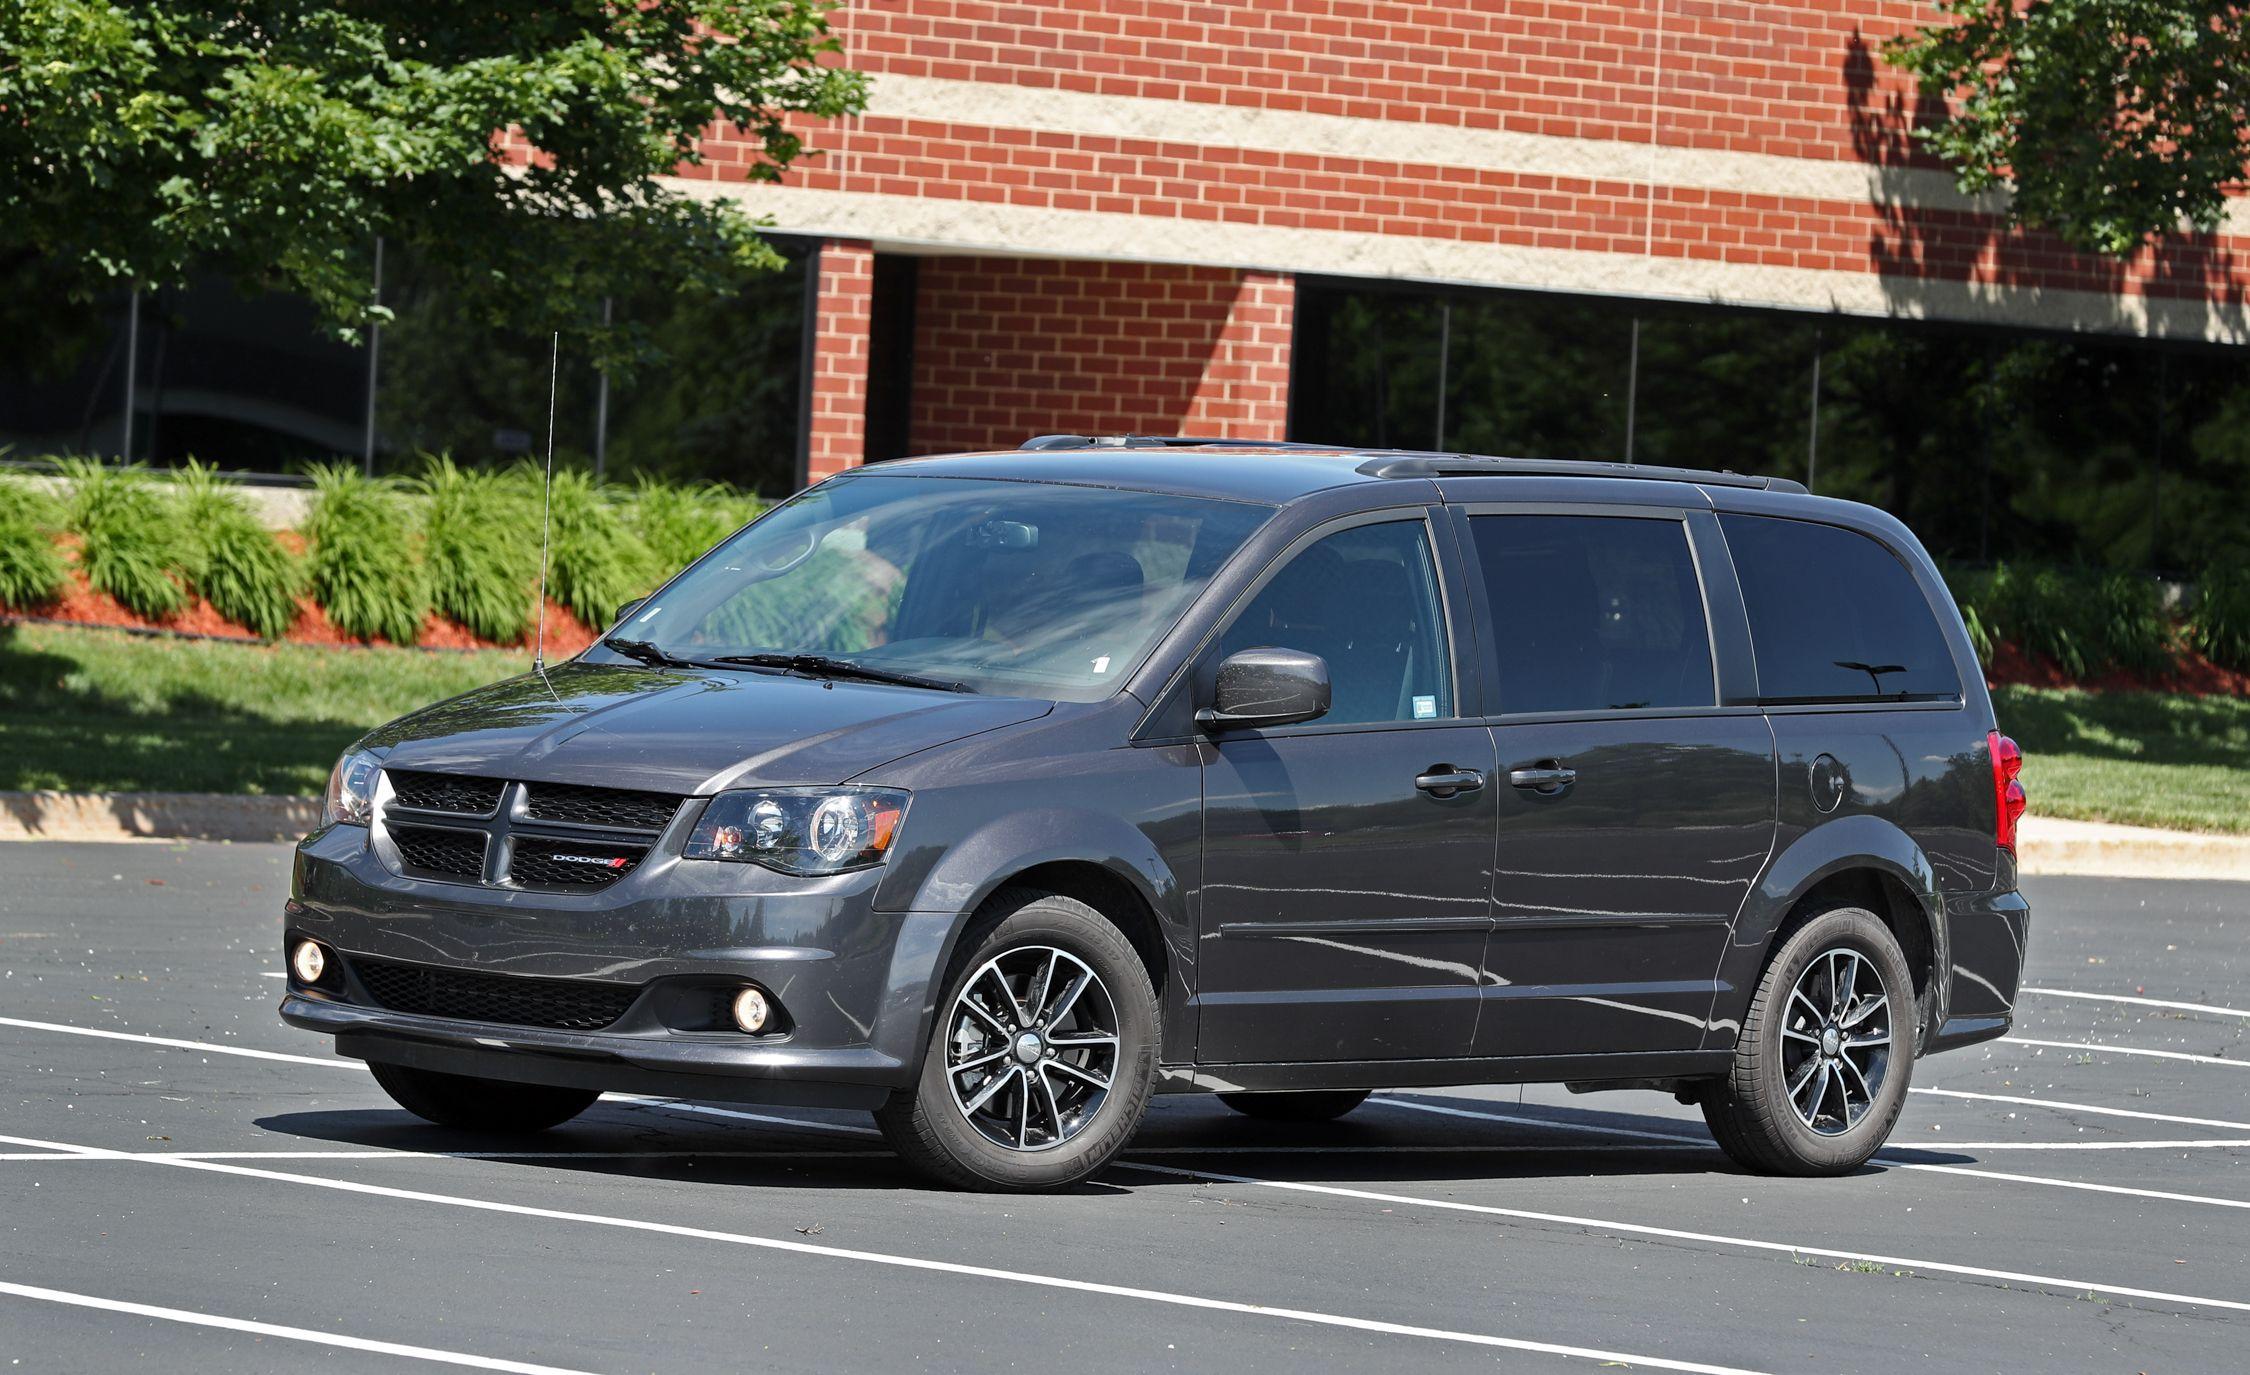 2019 Dodge Grand Caravan Reviews Price Photos Chrysler 3 8 Engine Coolant System Diagram And Specs Car Driver